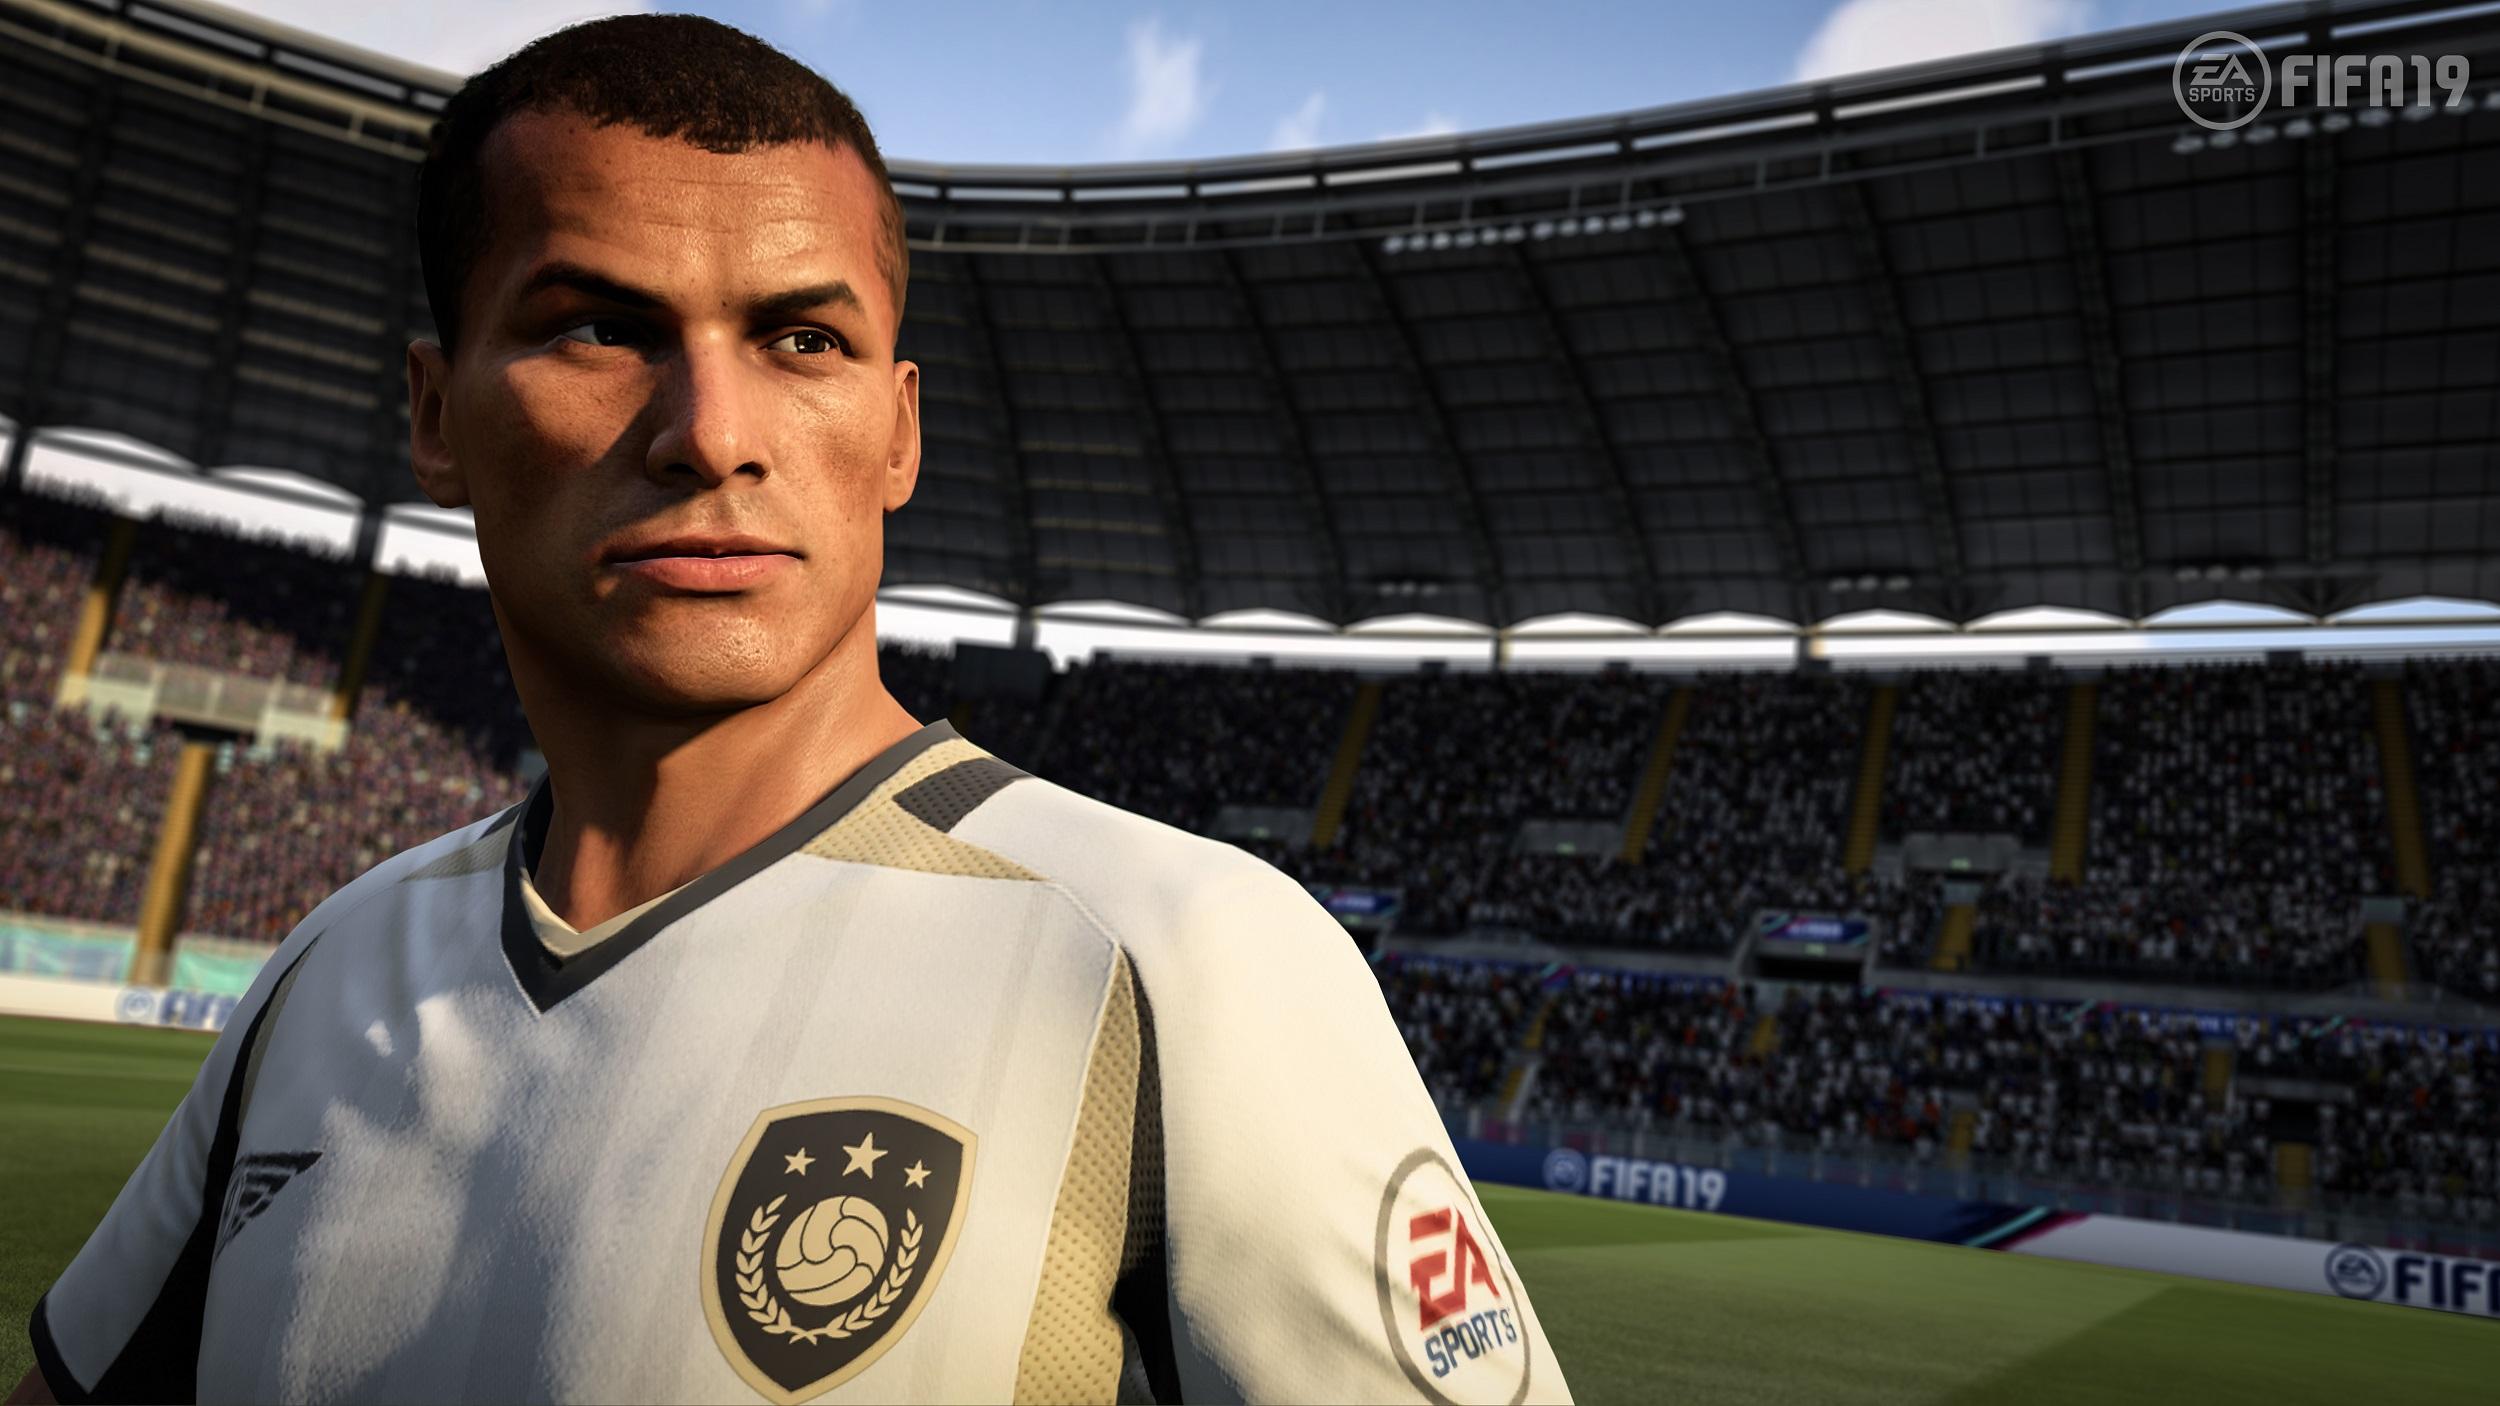 Image FIFA 19